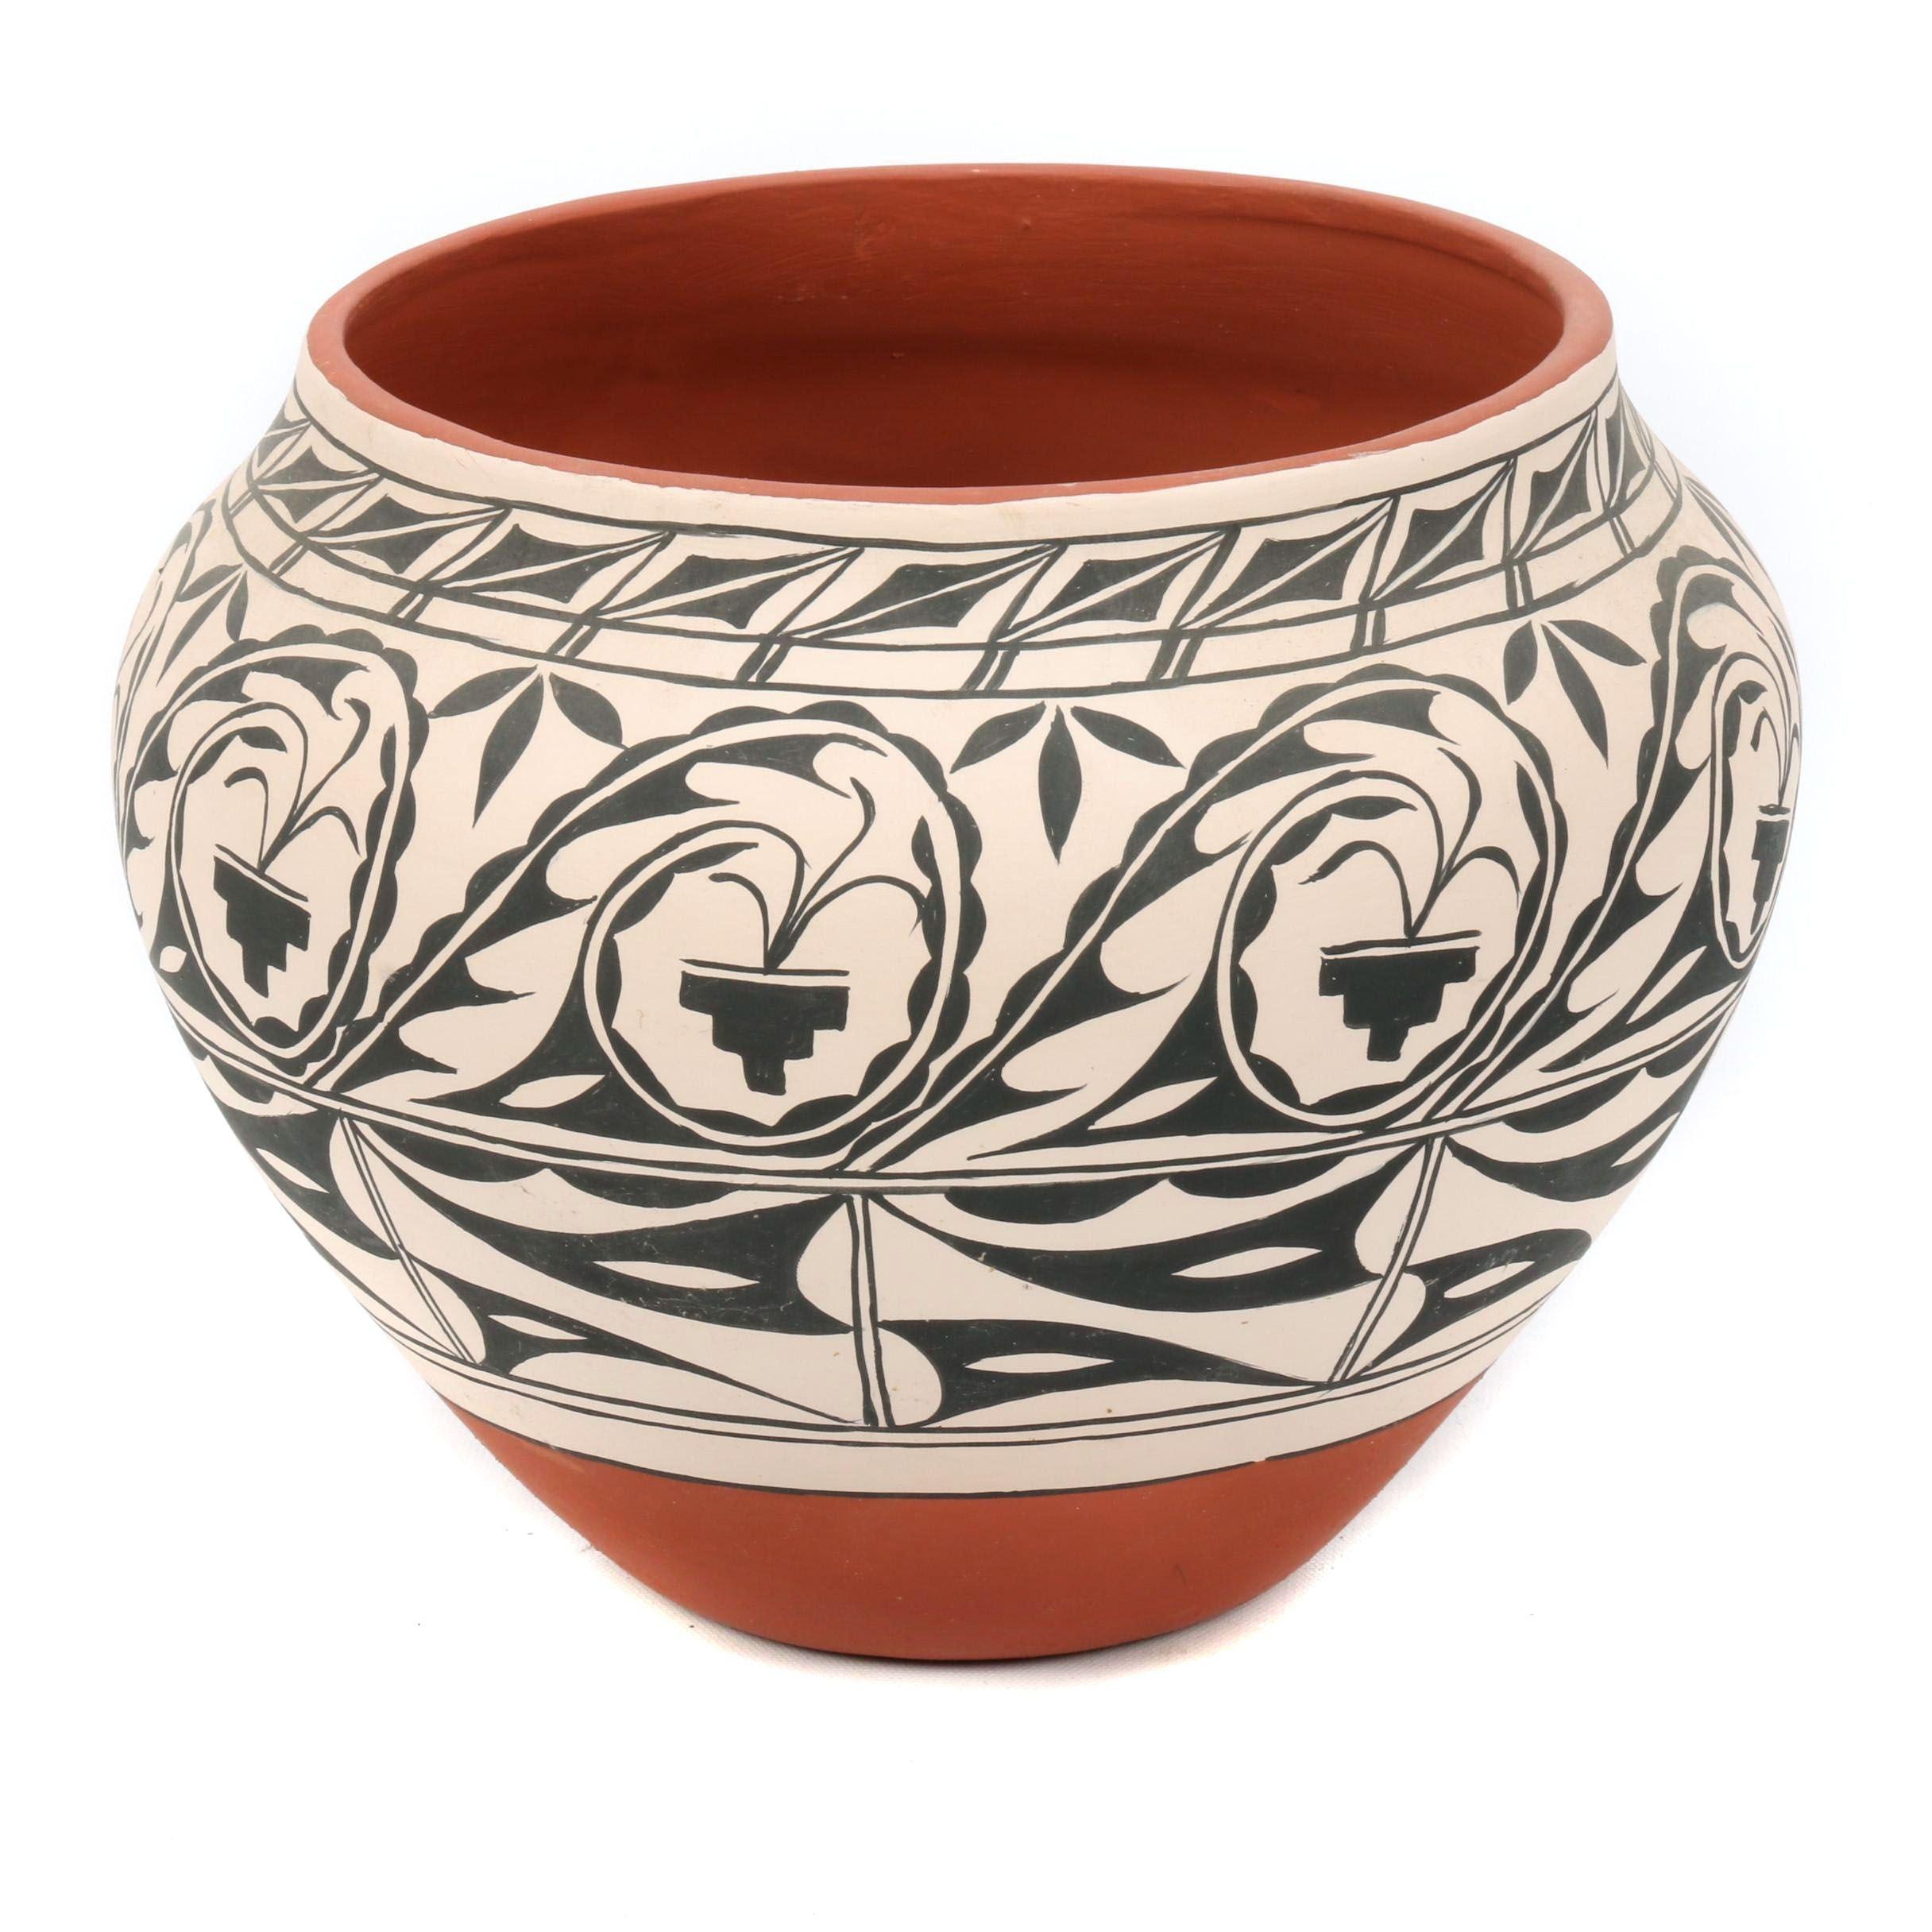 Josie Hand Cochiti Pueblo Polychrome Earthenware Vase